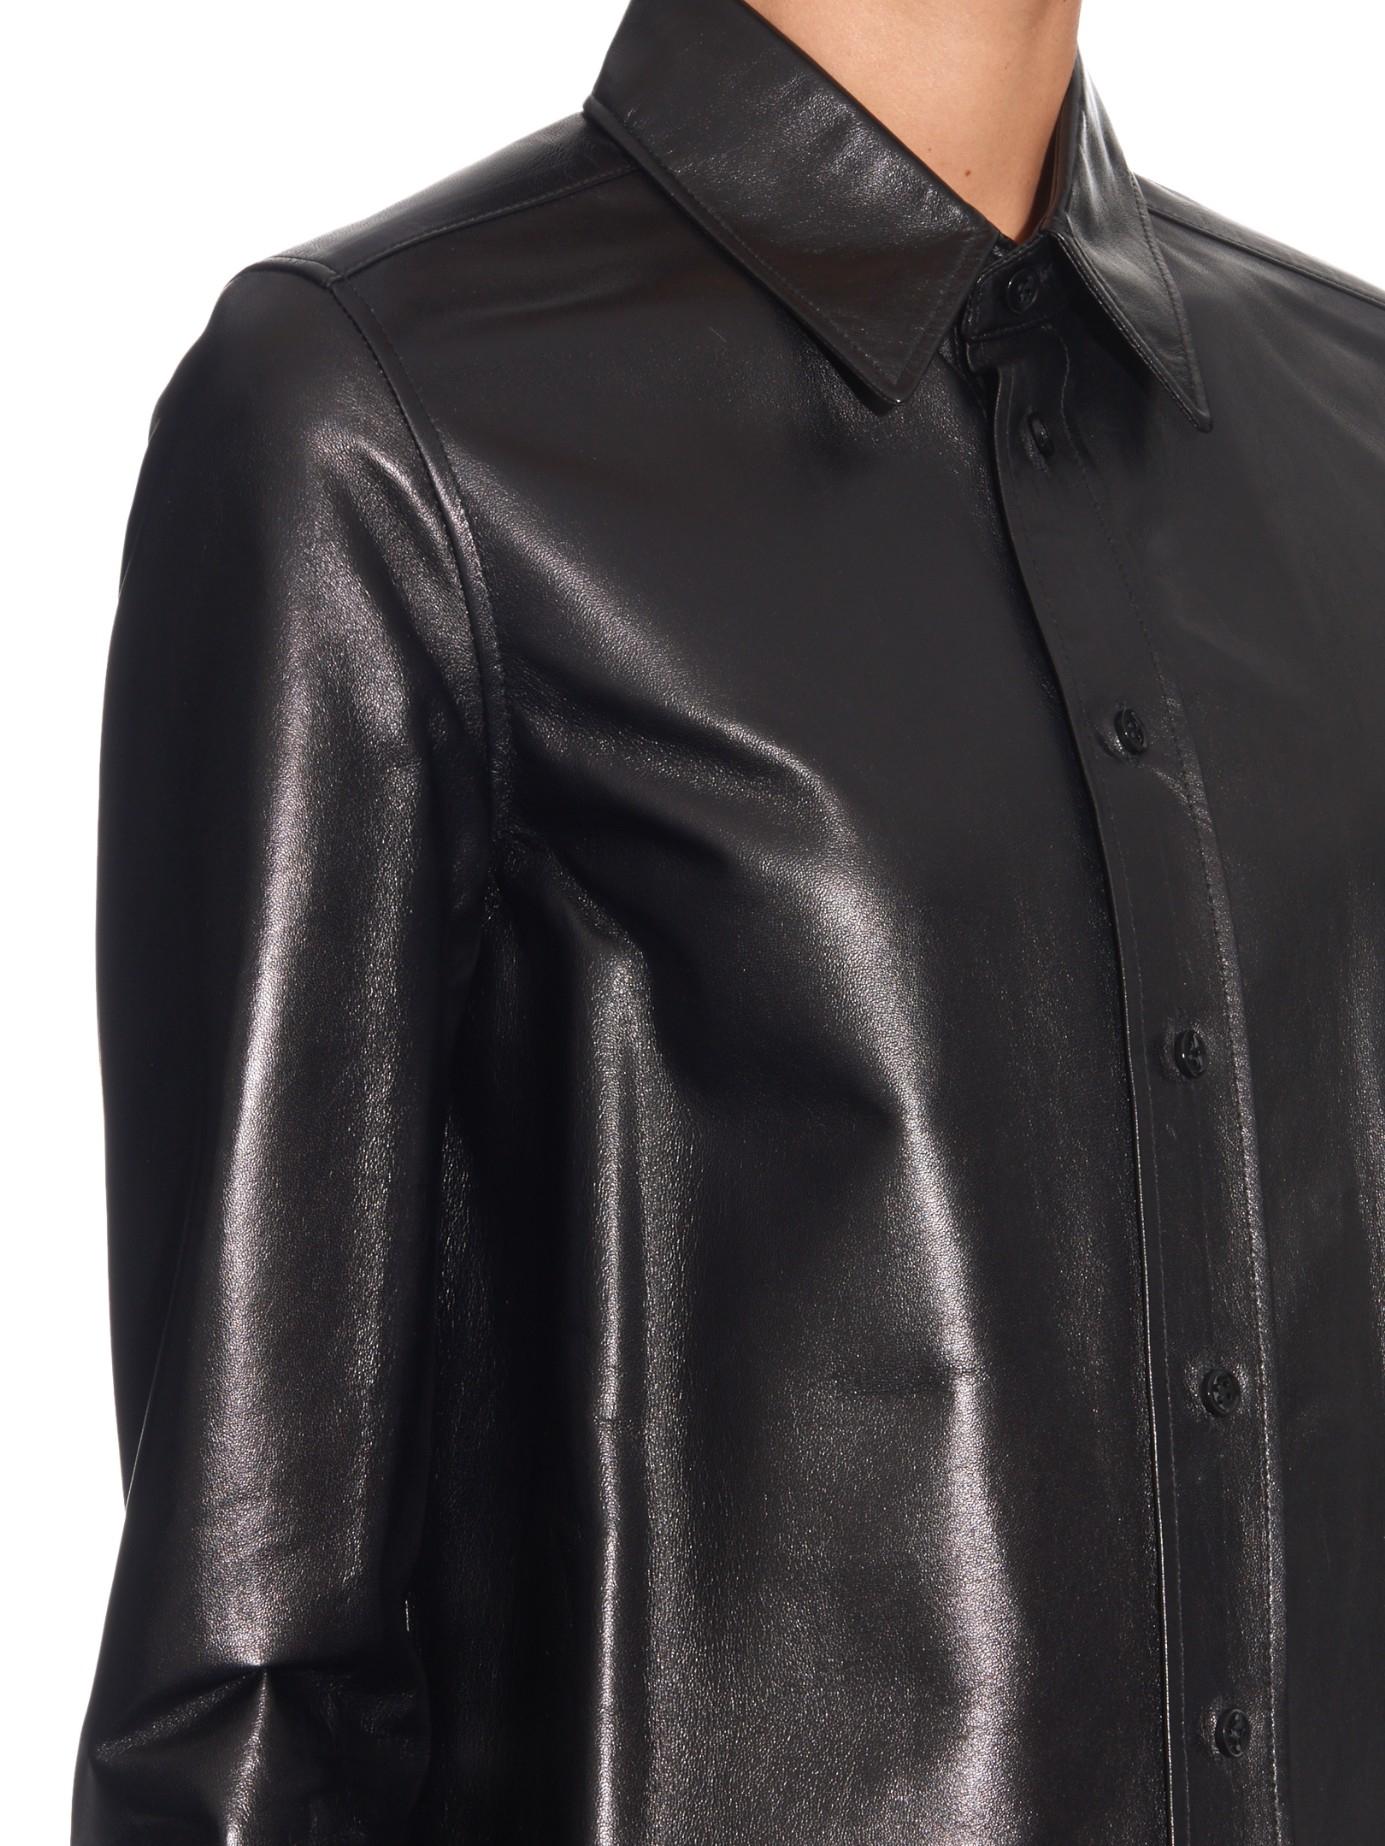 Saint laurent long sleeved leather shirt in black lyst for Saint laurent shirt womens